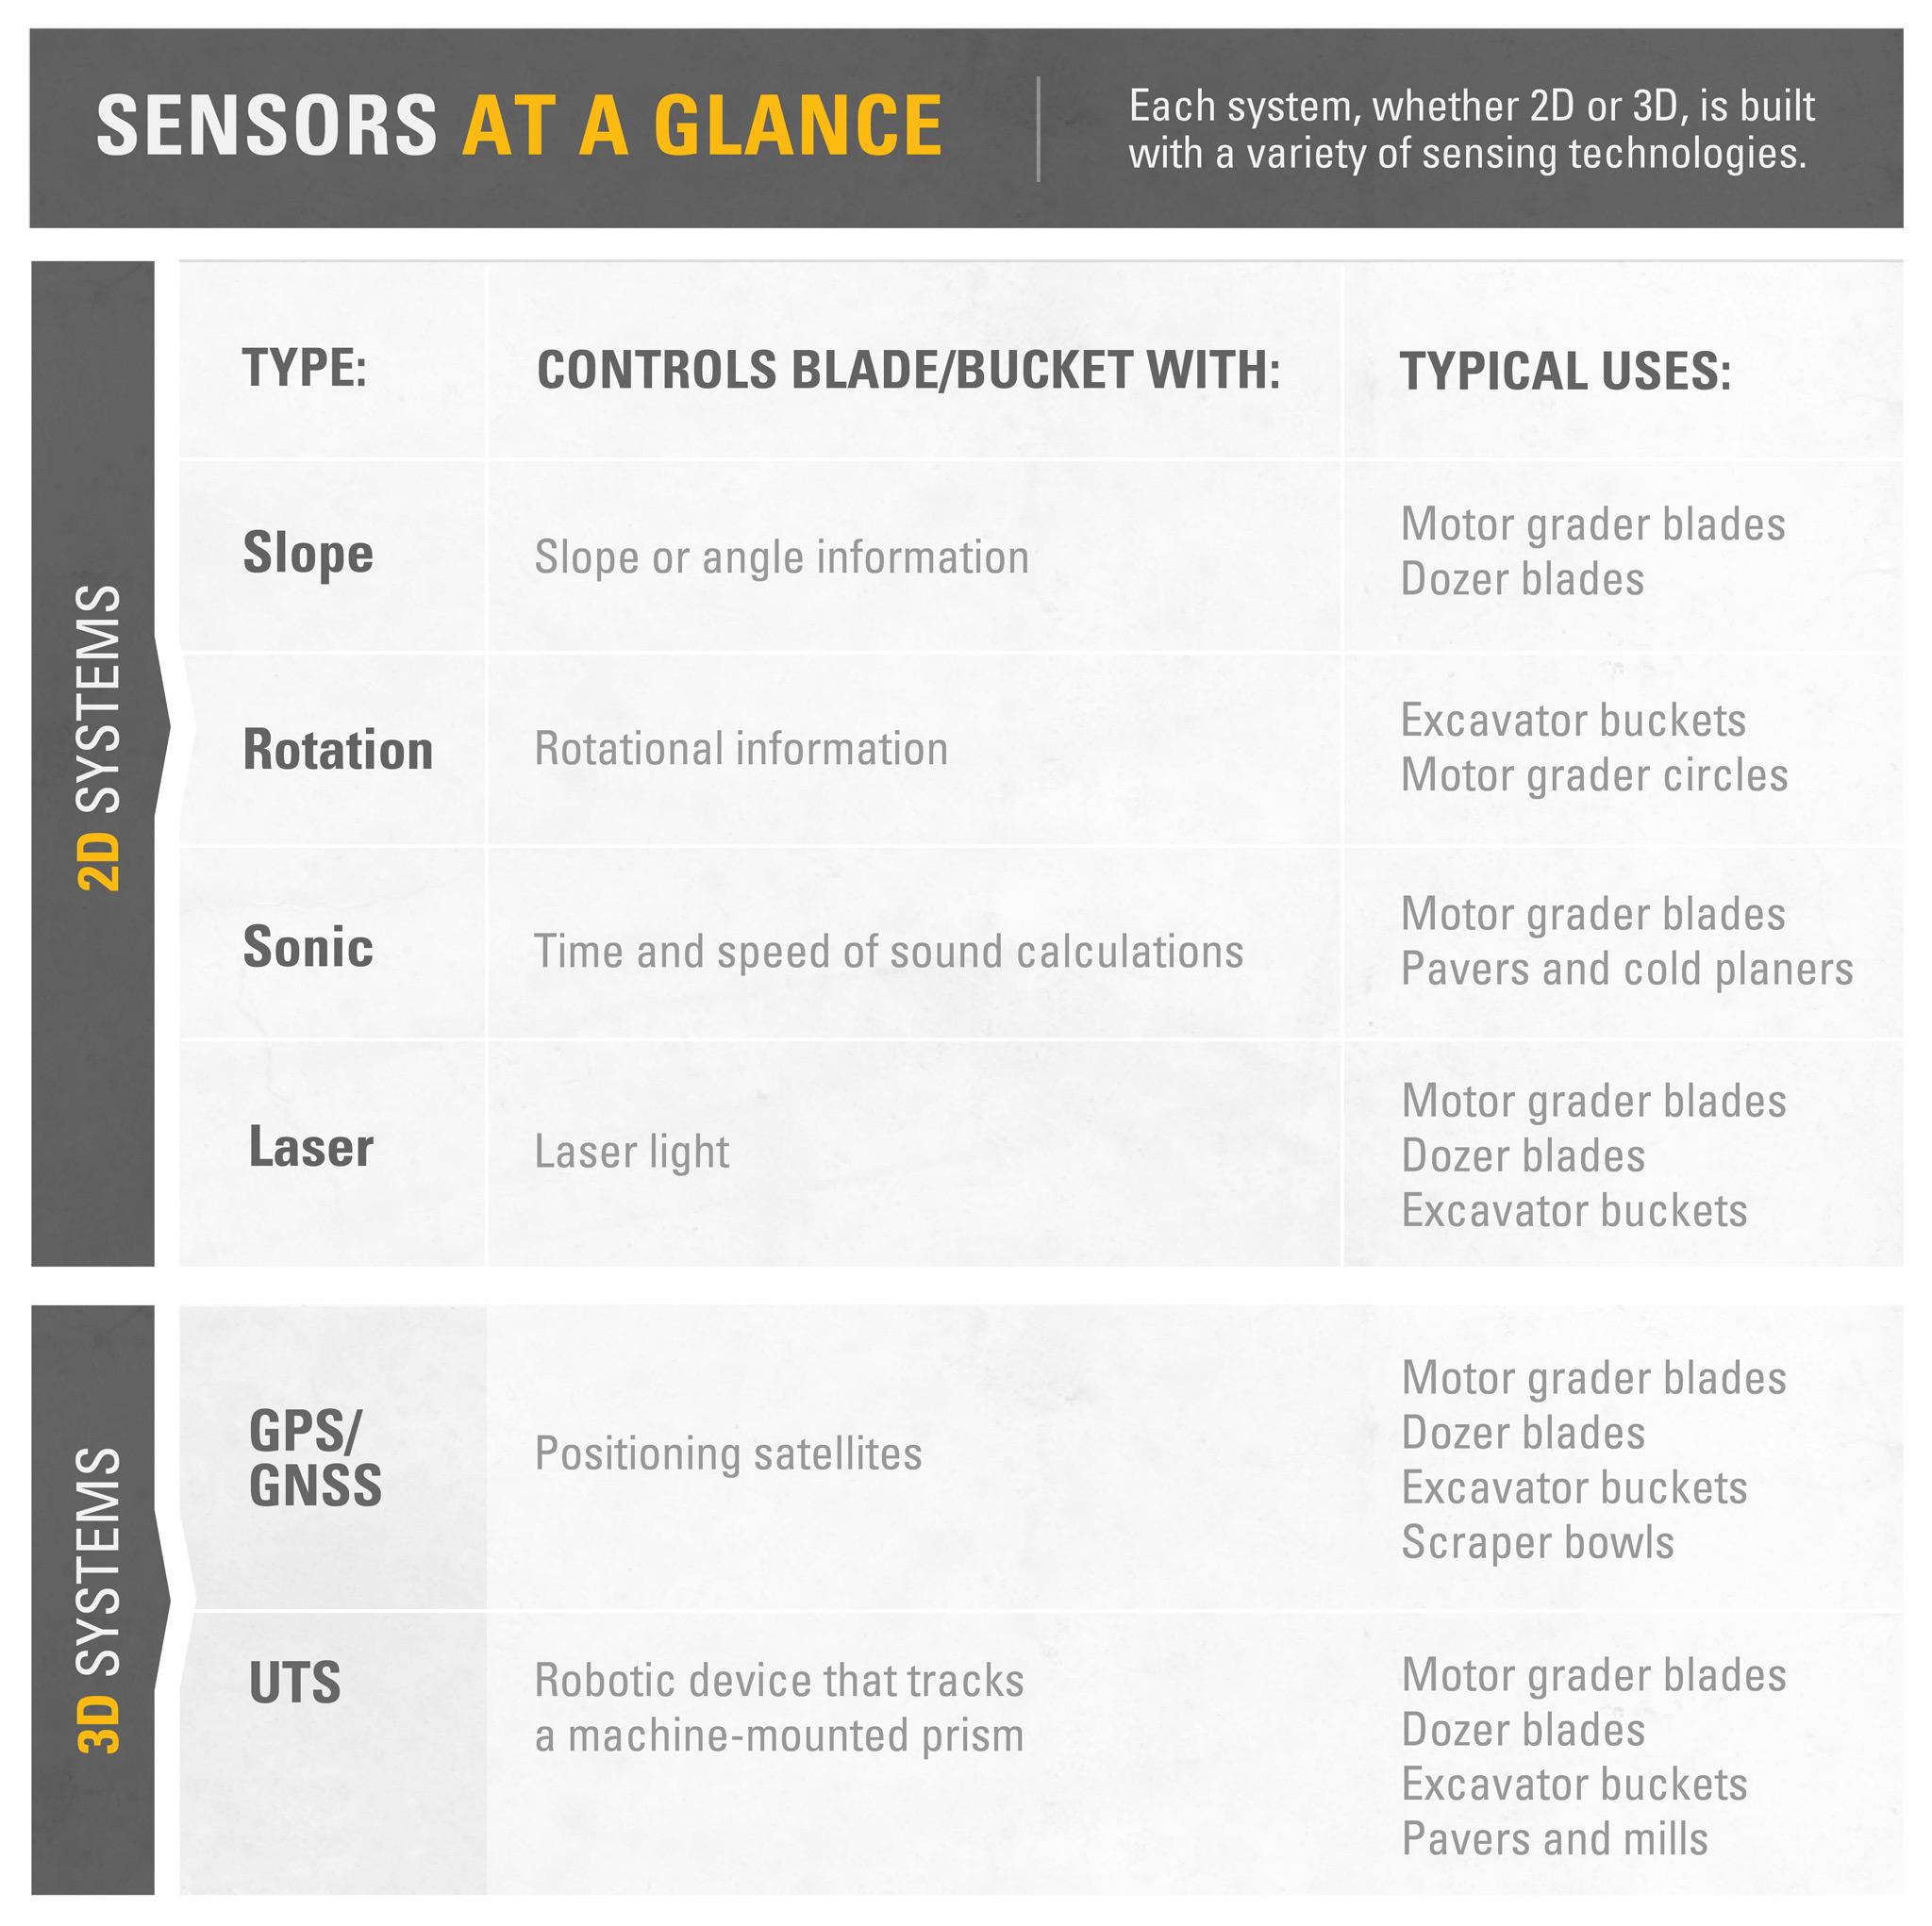 Sensors_At_Glance